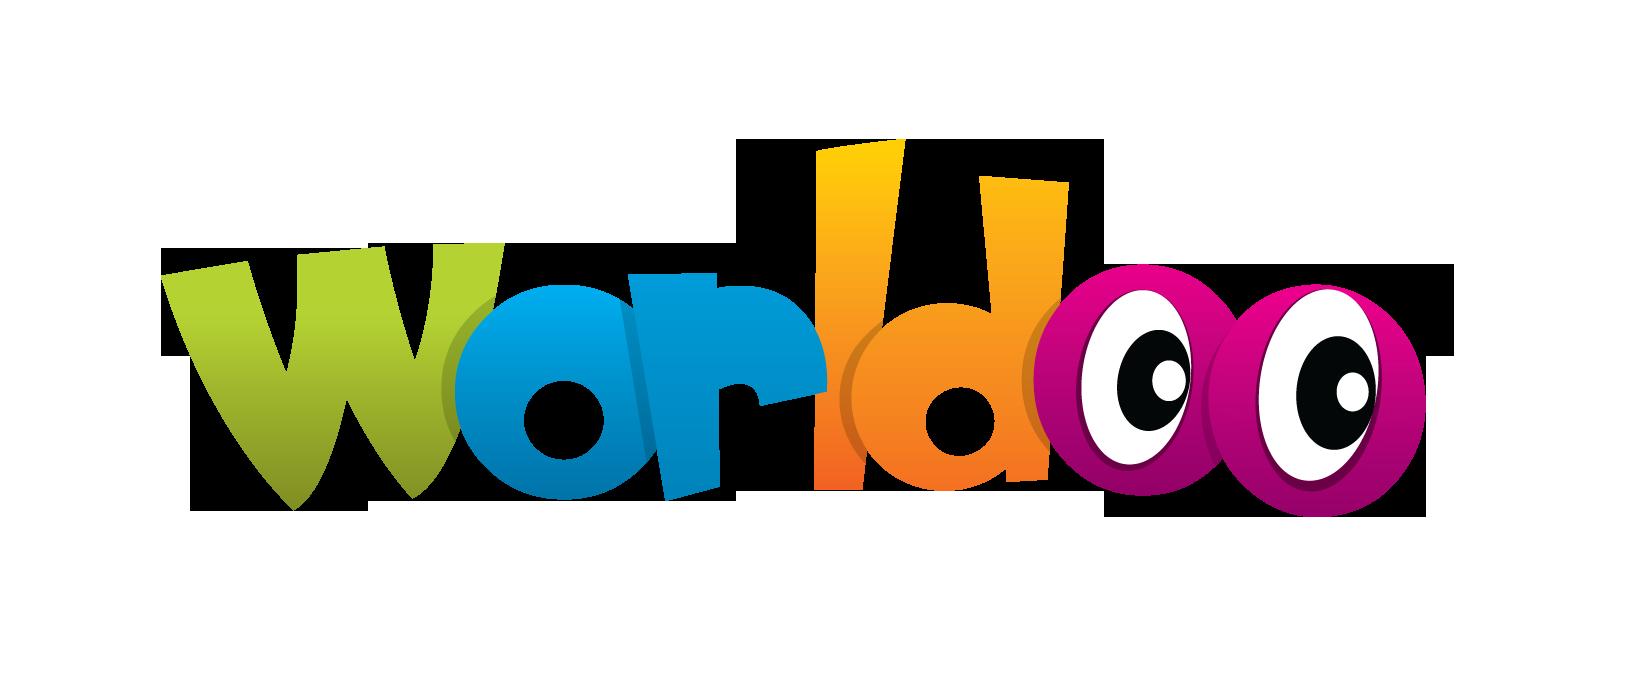 Worldoo Logo white BG